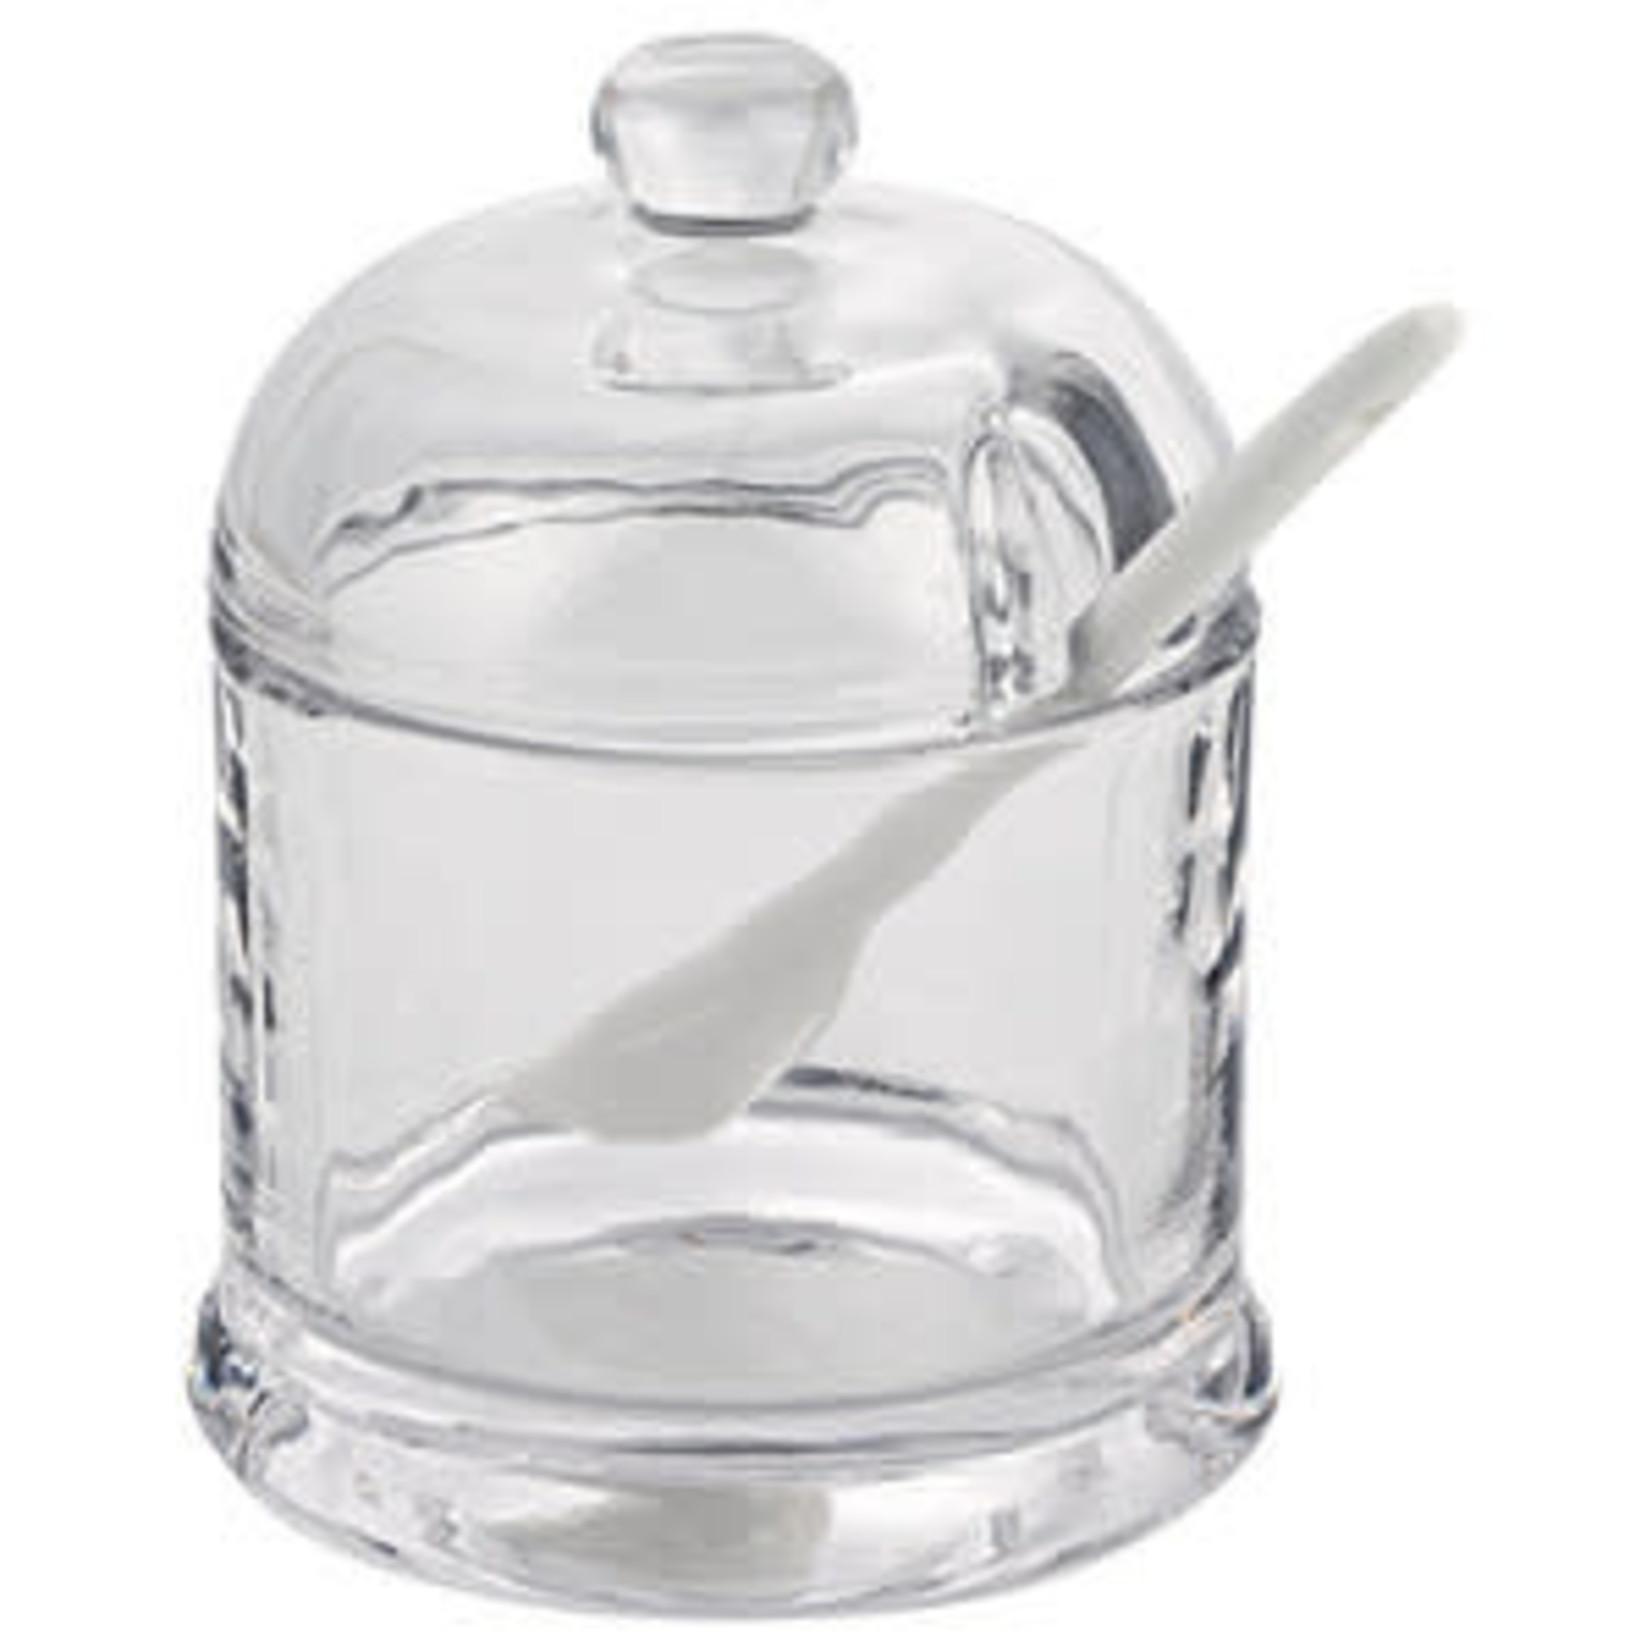 B85 Large Honey Jar with Spoon